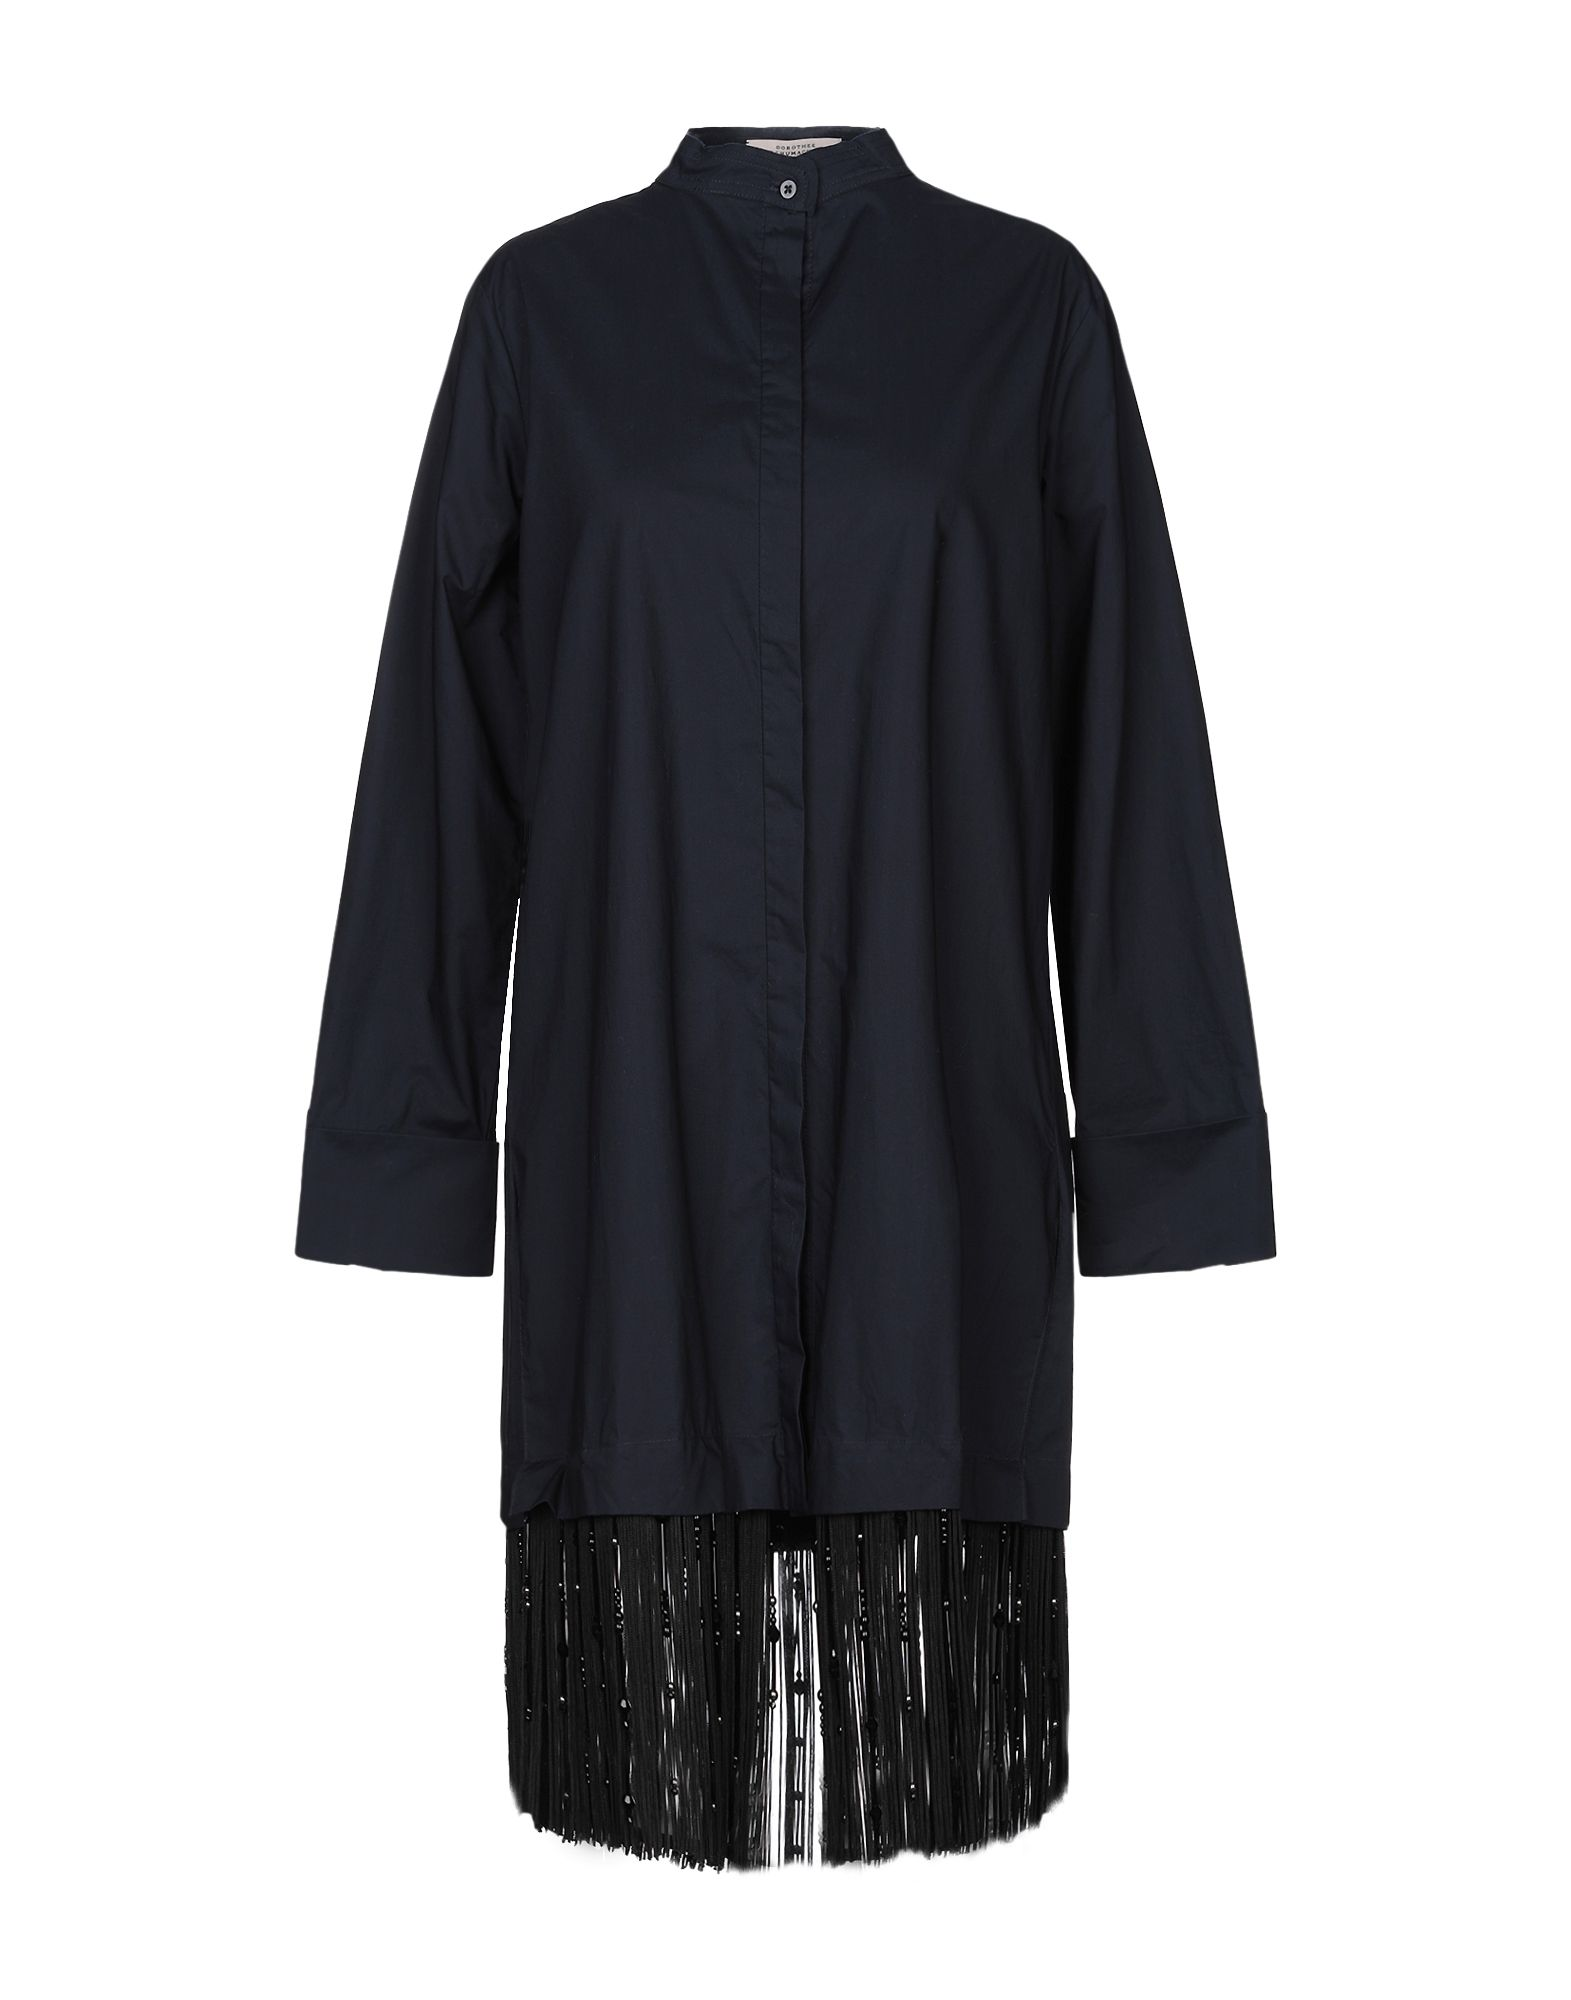 DOROTHEE SCHUMACHER Короткое платье платье рубашка fox yulia sway платье рубашка fox